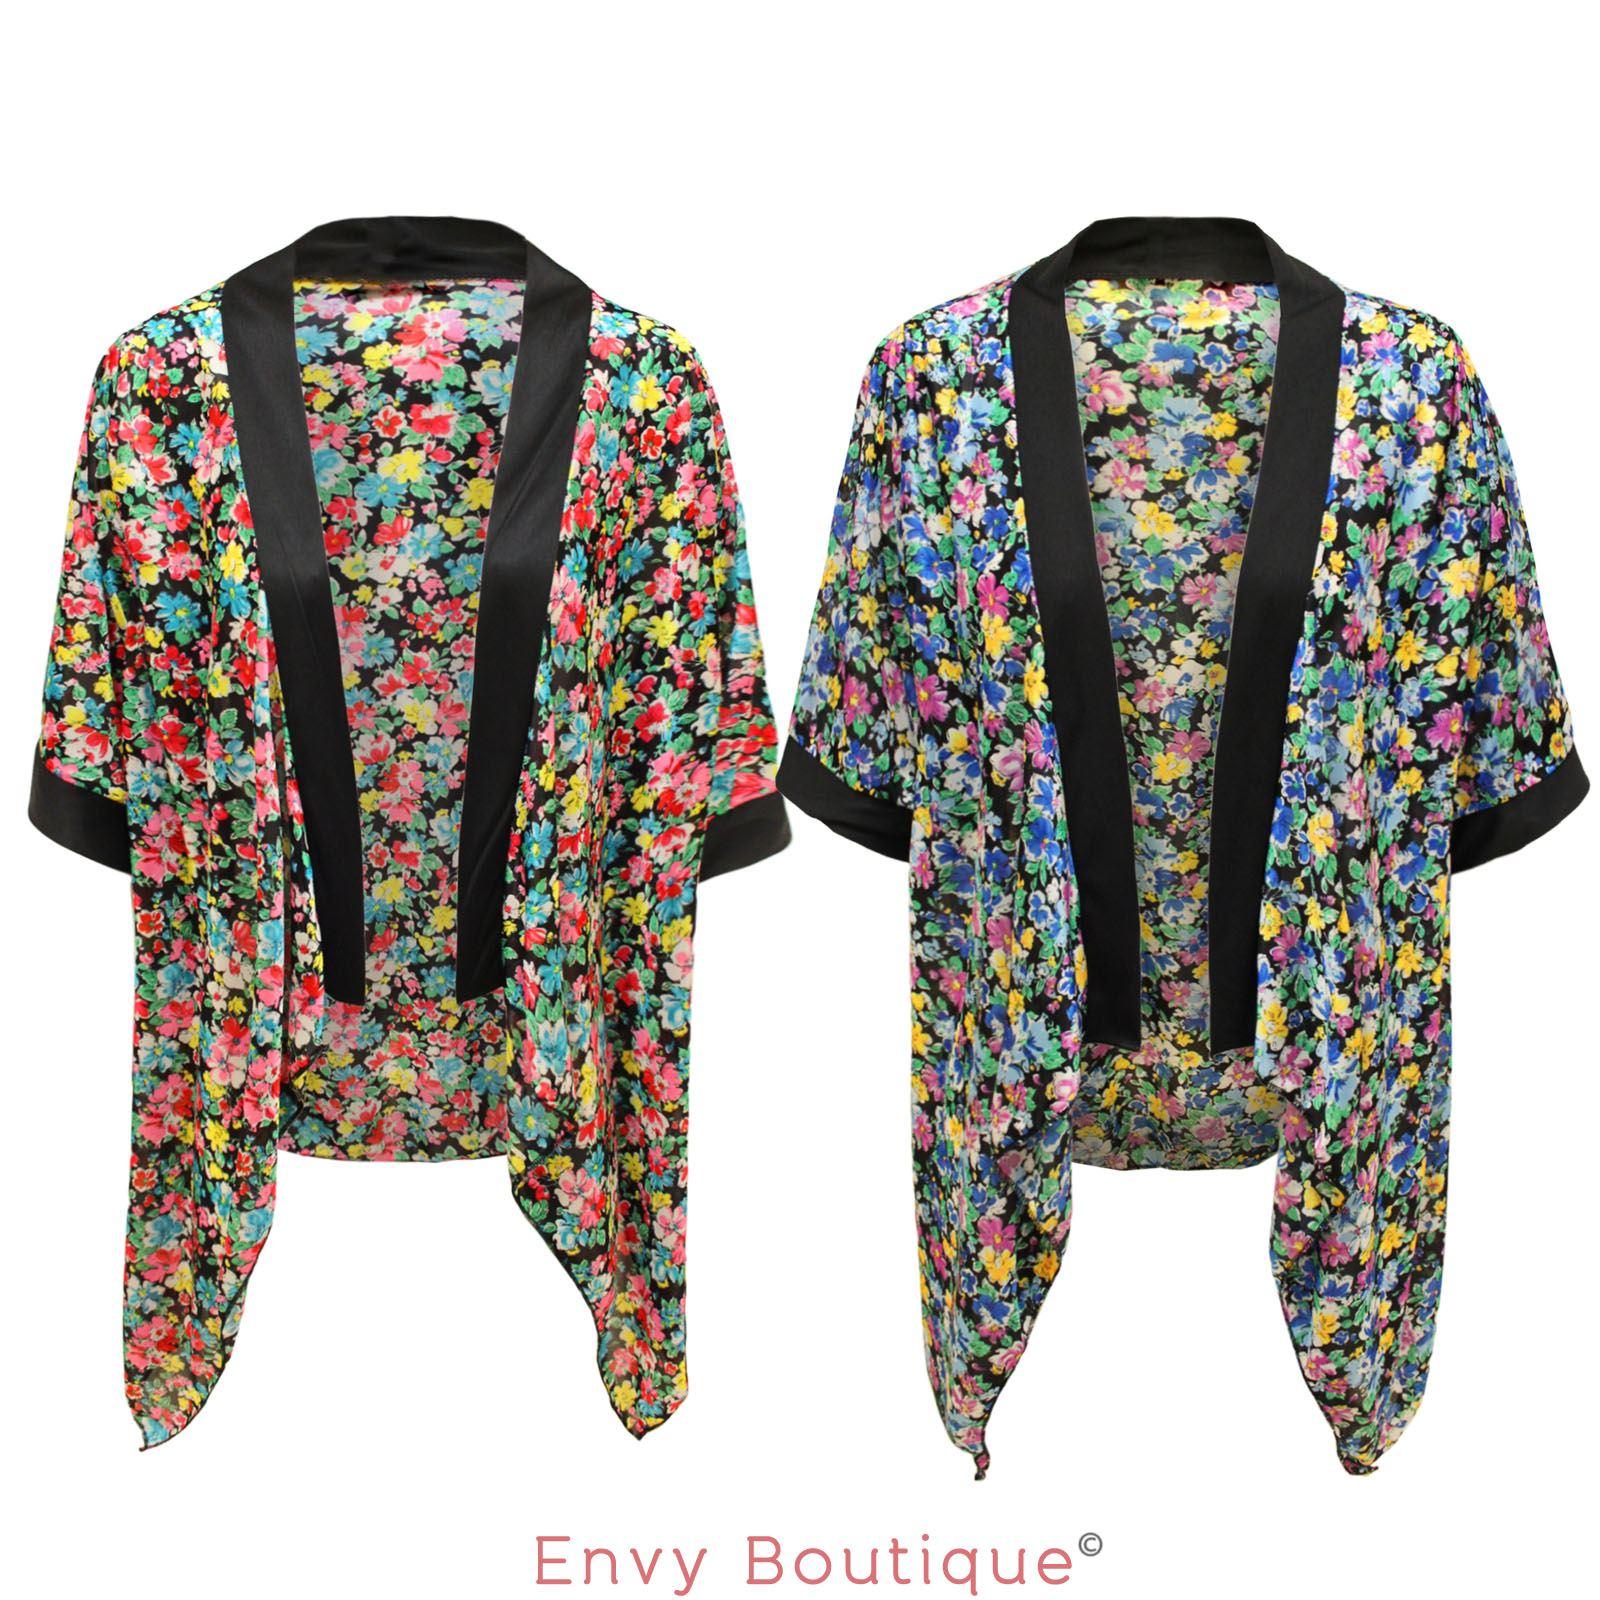 Damen vintage blumen druck top kimono umhang offene for Kimono jacke damen